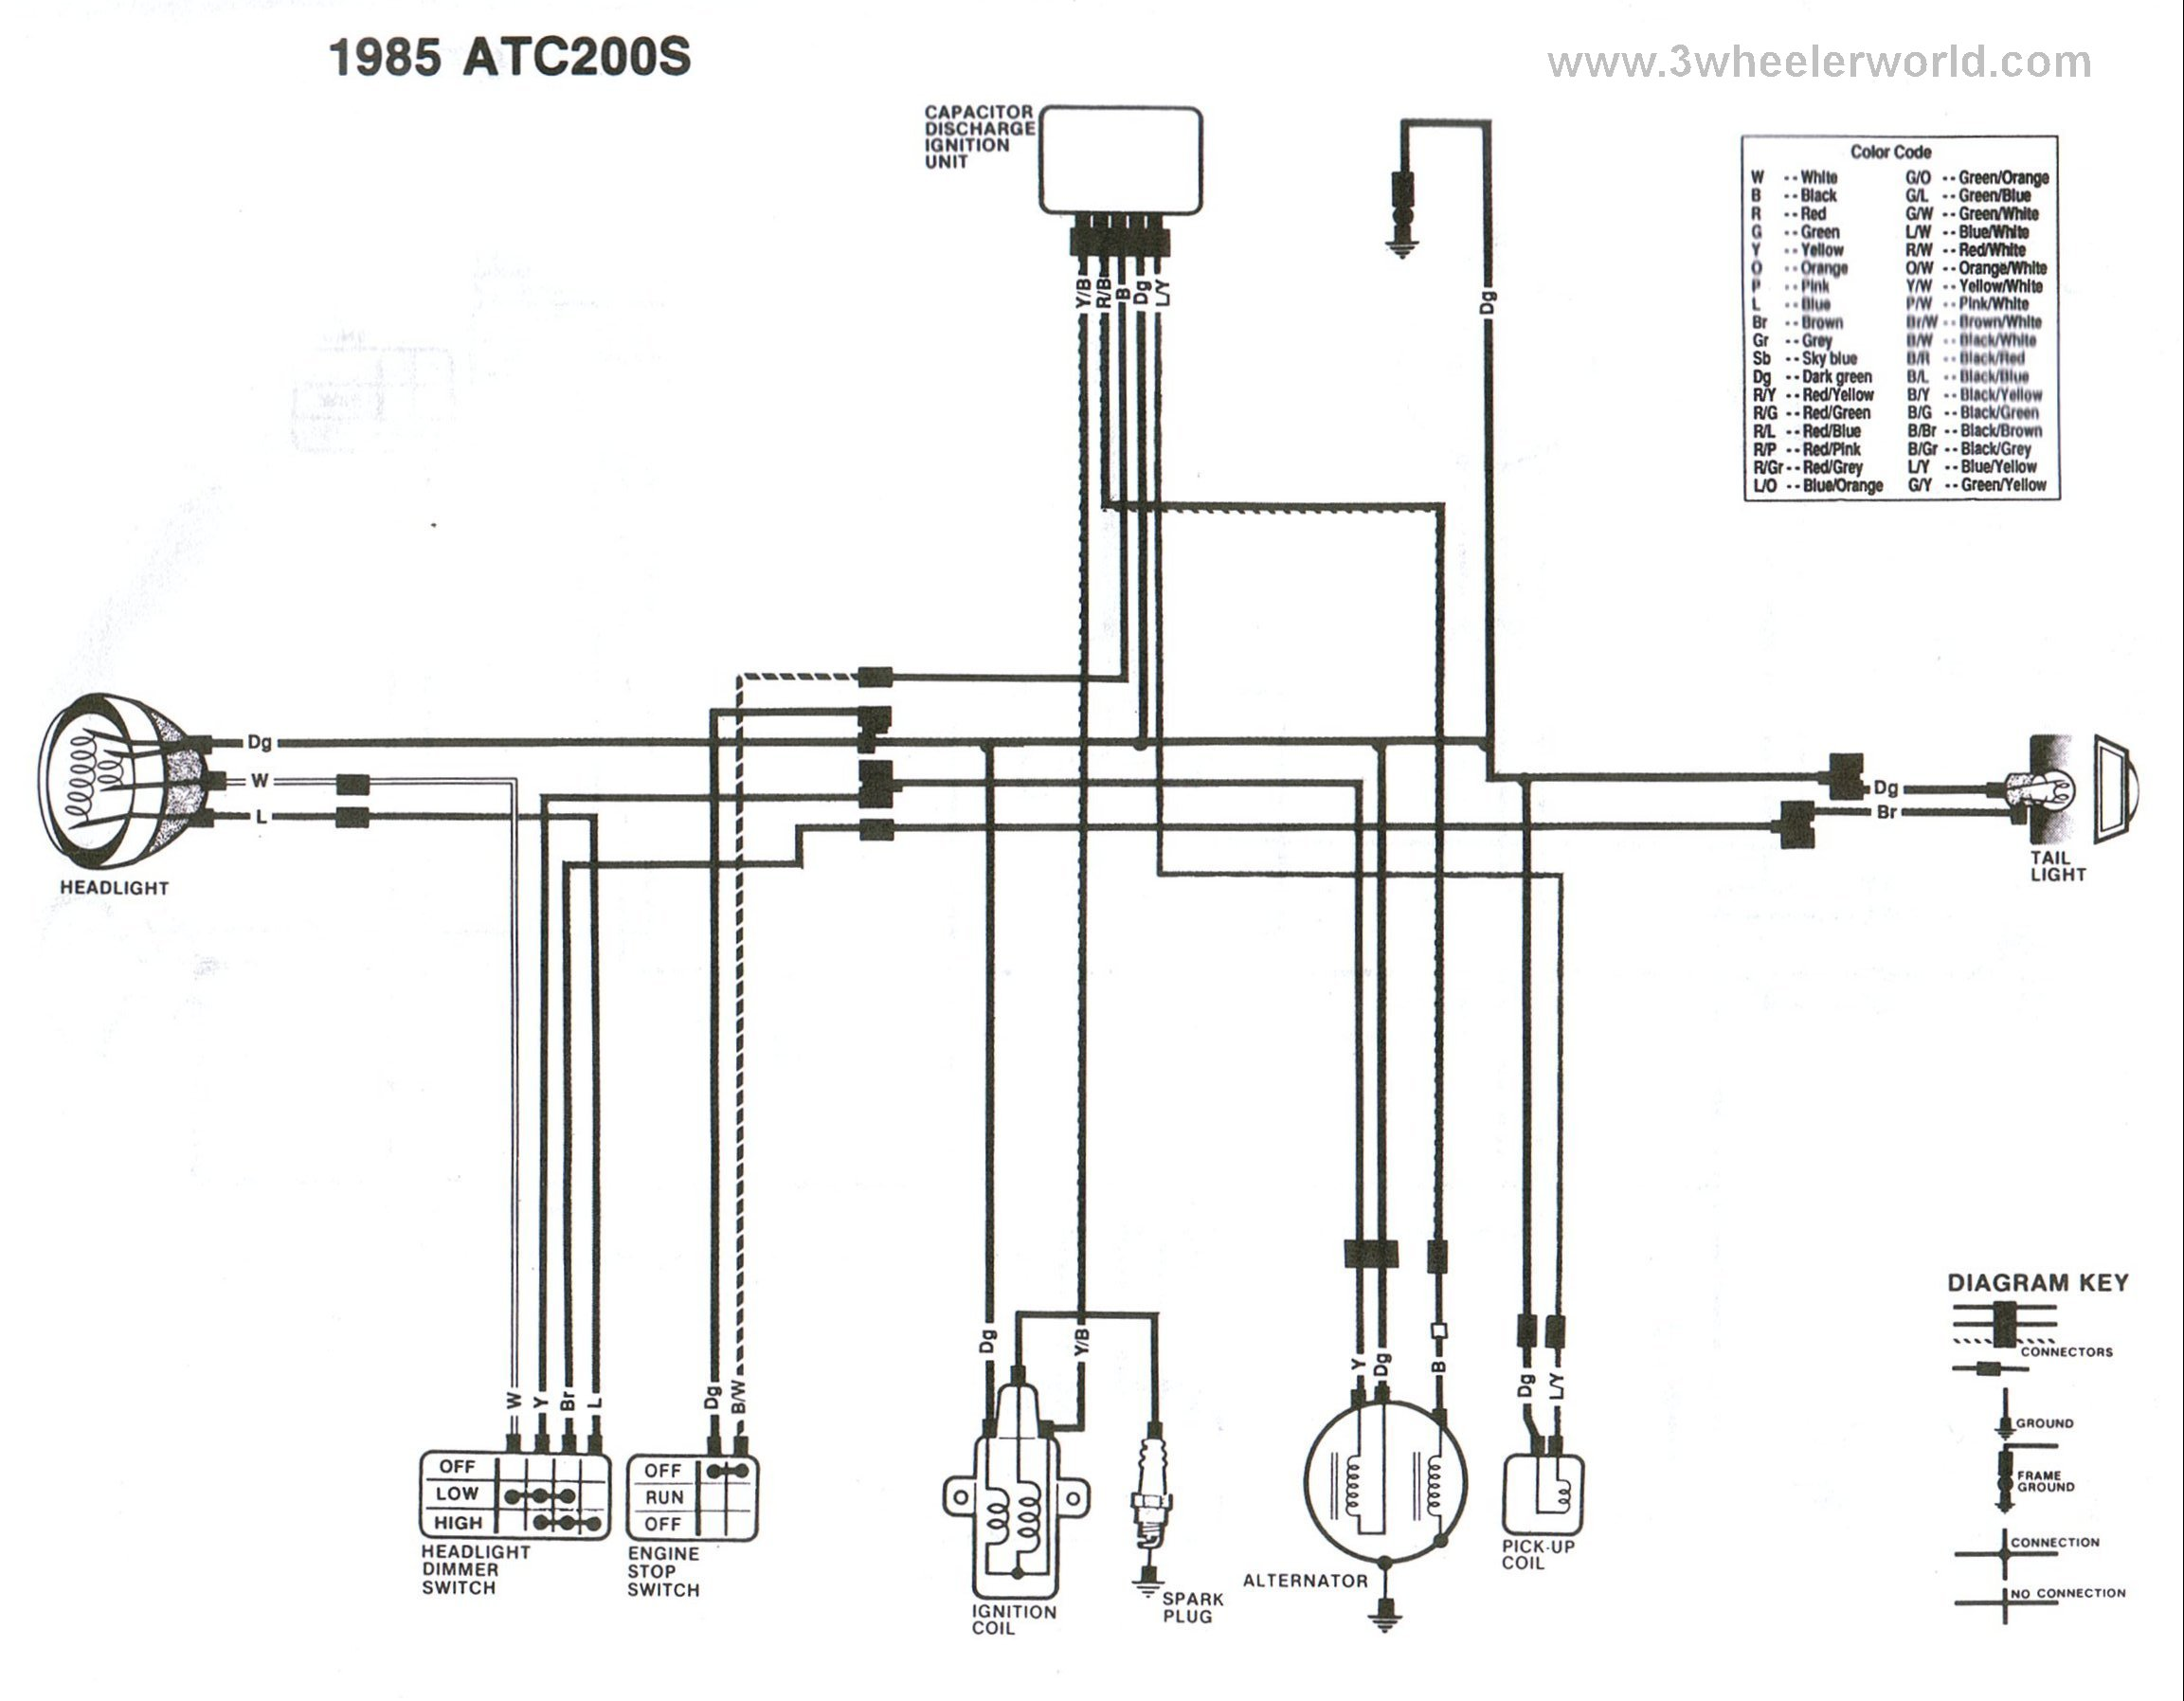 Marvelous Honda Xr200 Wiring Harness Diagram Wiring Diagram Database Wiring Cloud Hisonuggs Outletorg